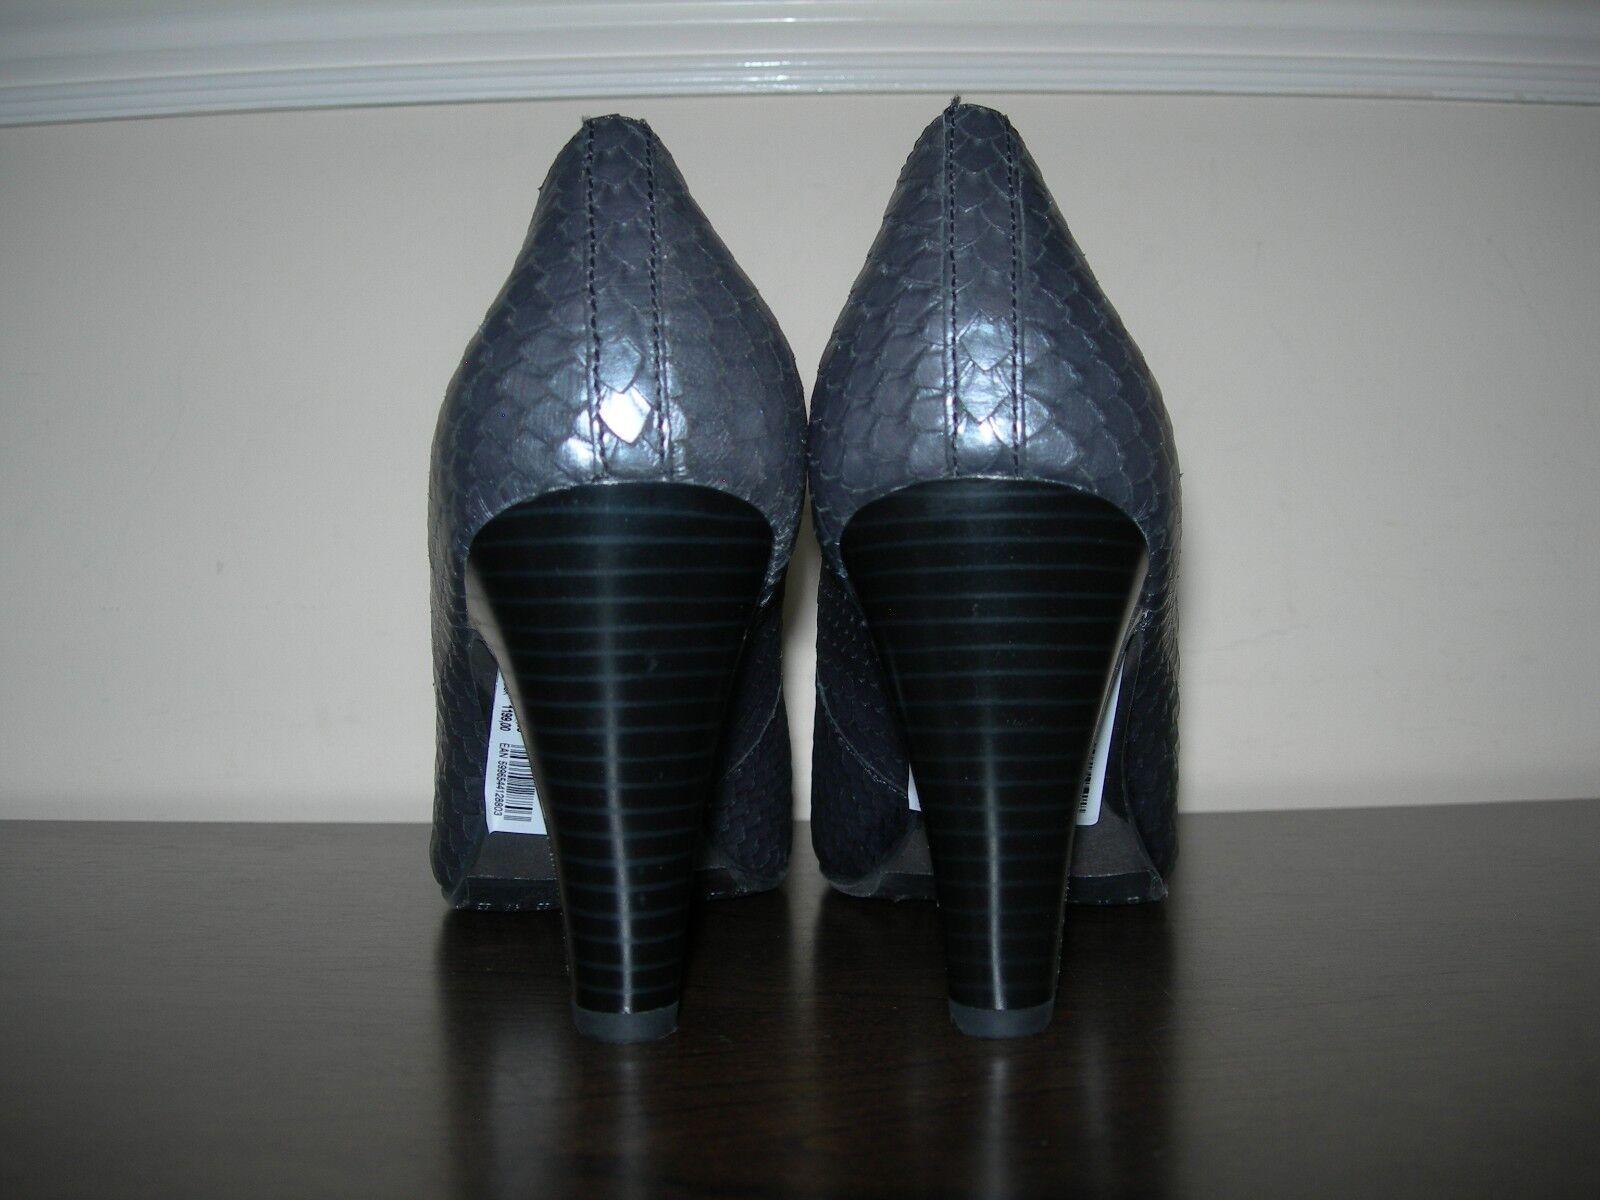 GERRY COURT WEBER WOMEN'S COURT GERRY Schuhe HEELS 100% LEATHER ANTHRACITE GREY EU 39 / UK 6 ff5b1c